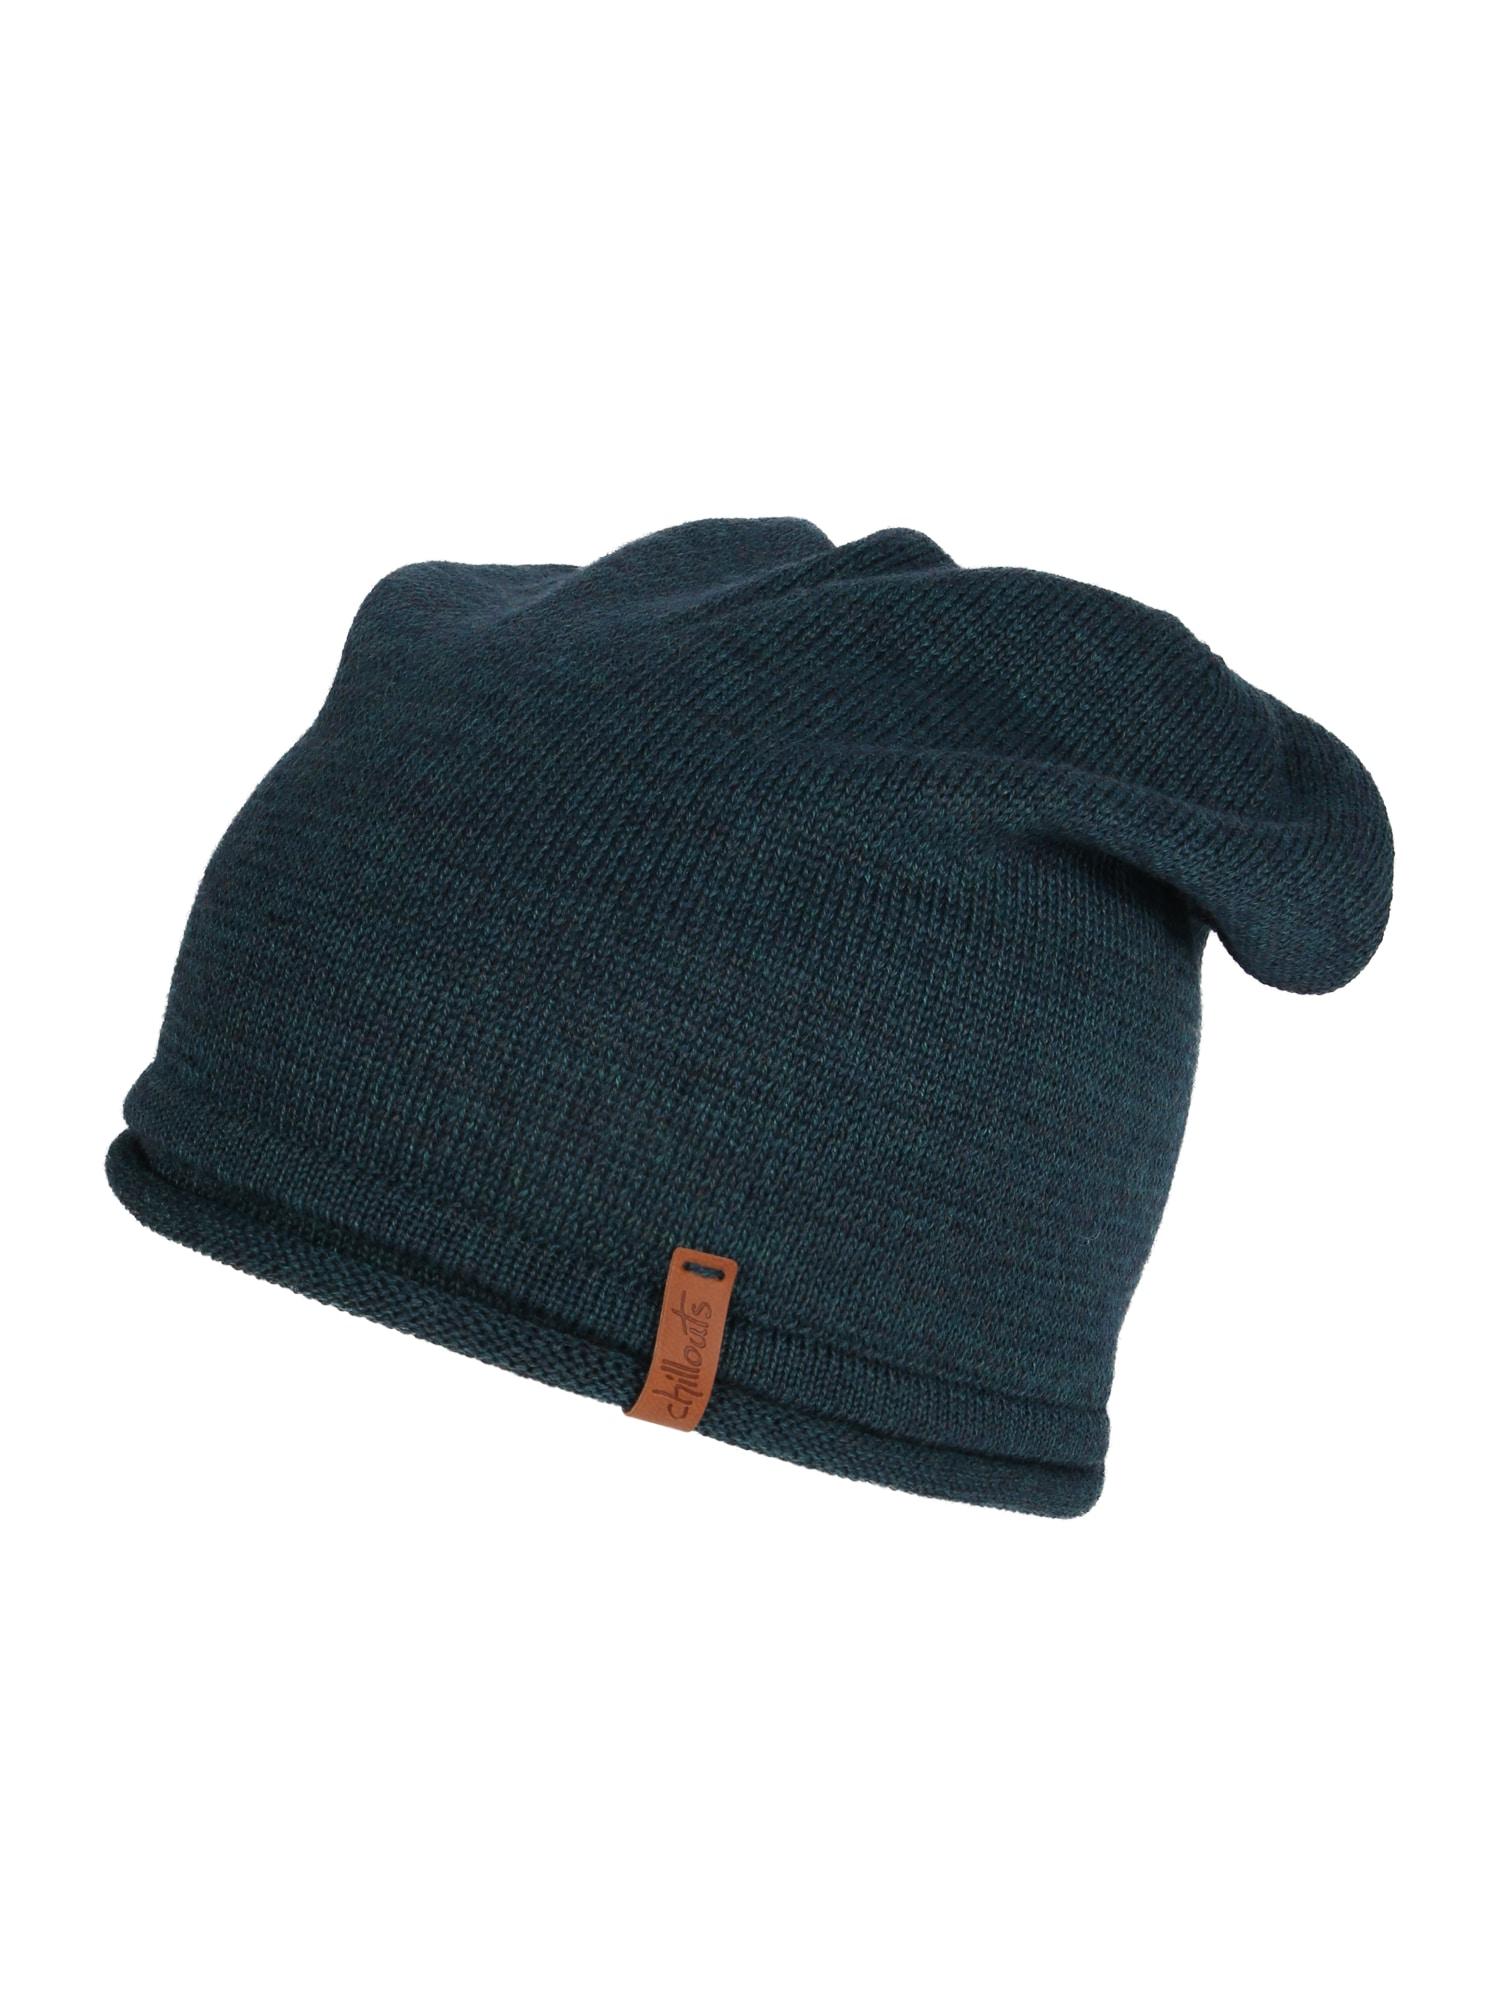 chillouts Megzta kepurė 'Leicester Hat' žalia